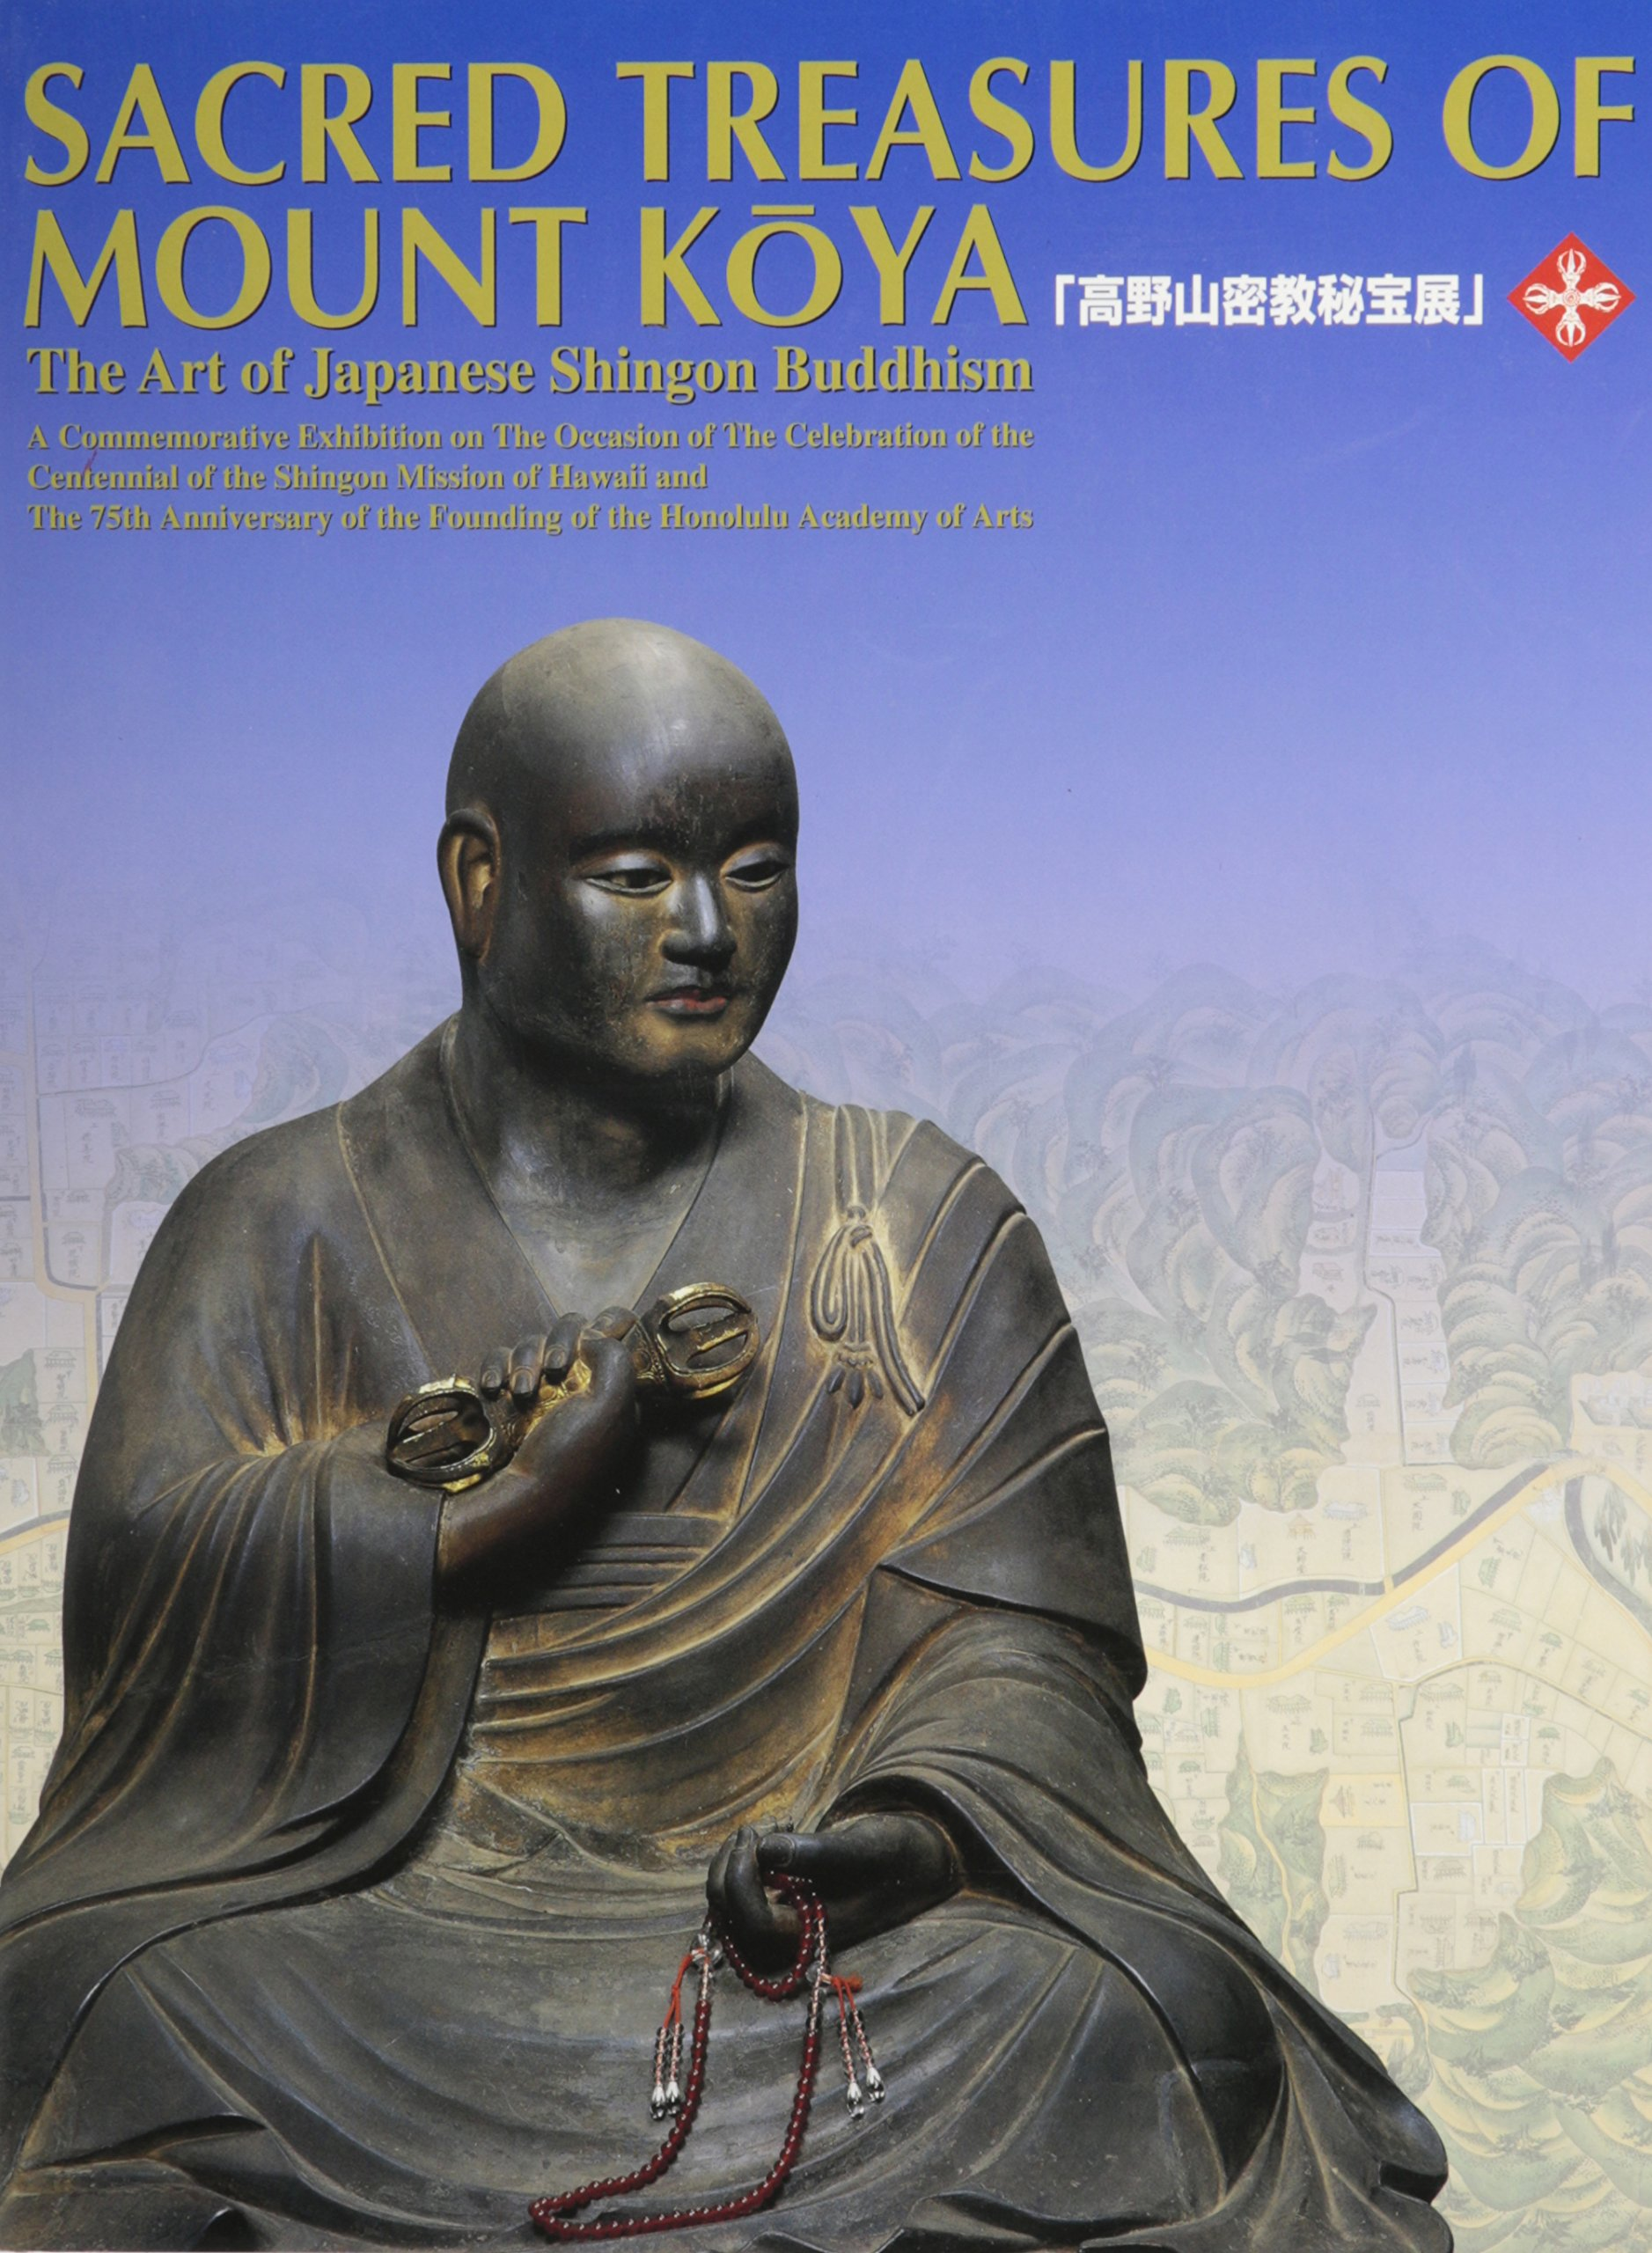 Sacred Treasures of Mount Koya The Art of Japanese Shingon Buddhism